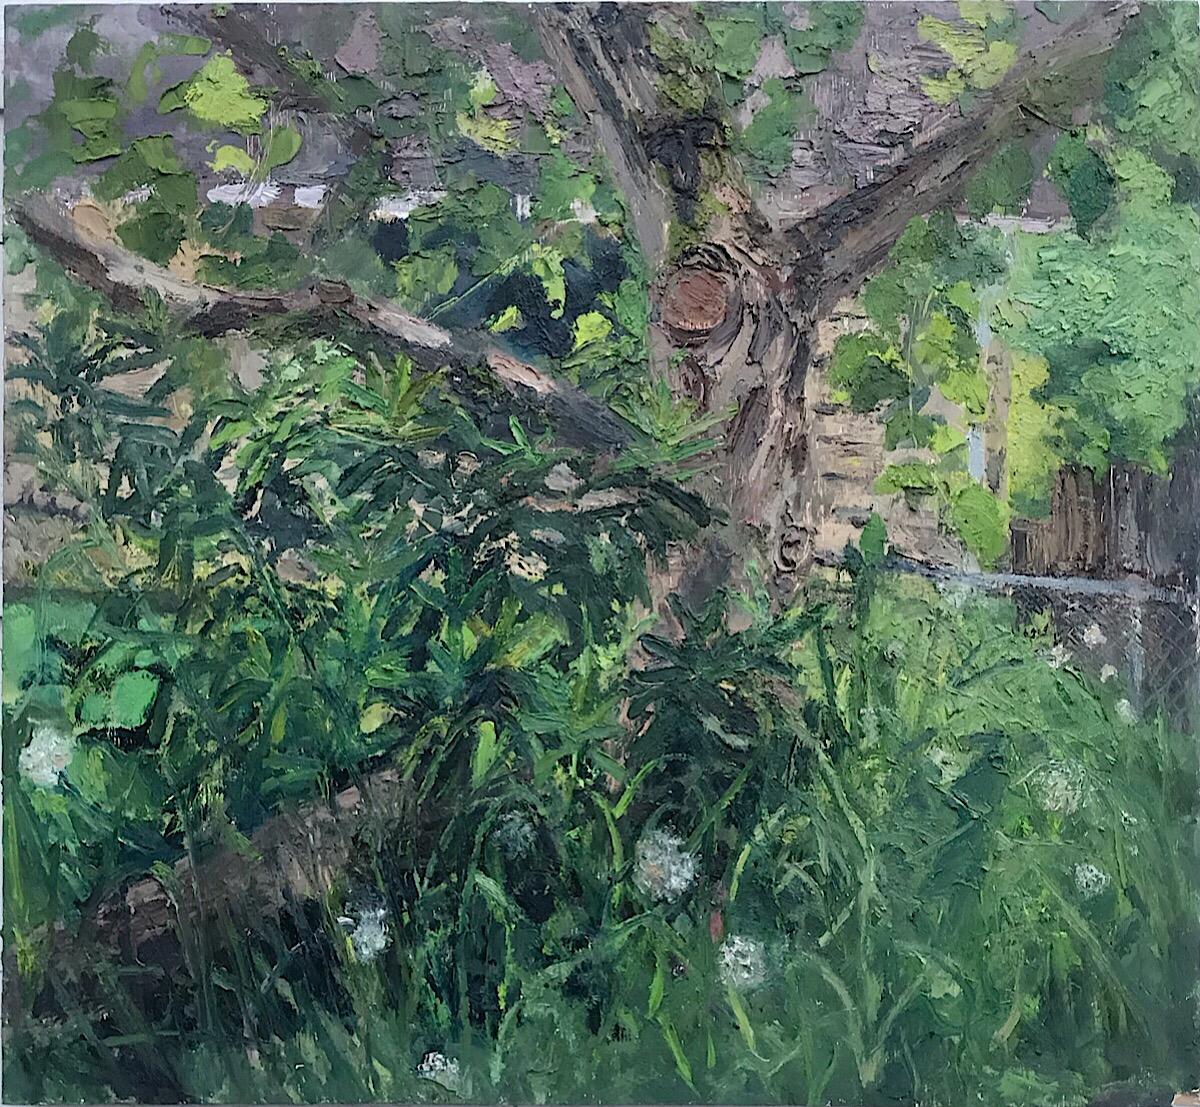 Apple Tree, oil on panel, 30.5 x 33 in., 2019